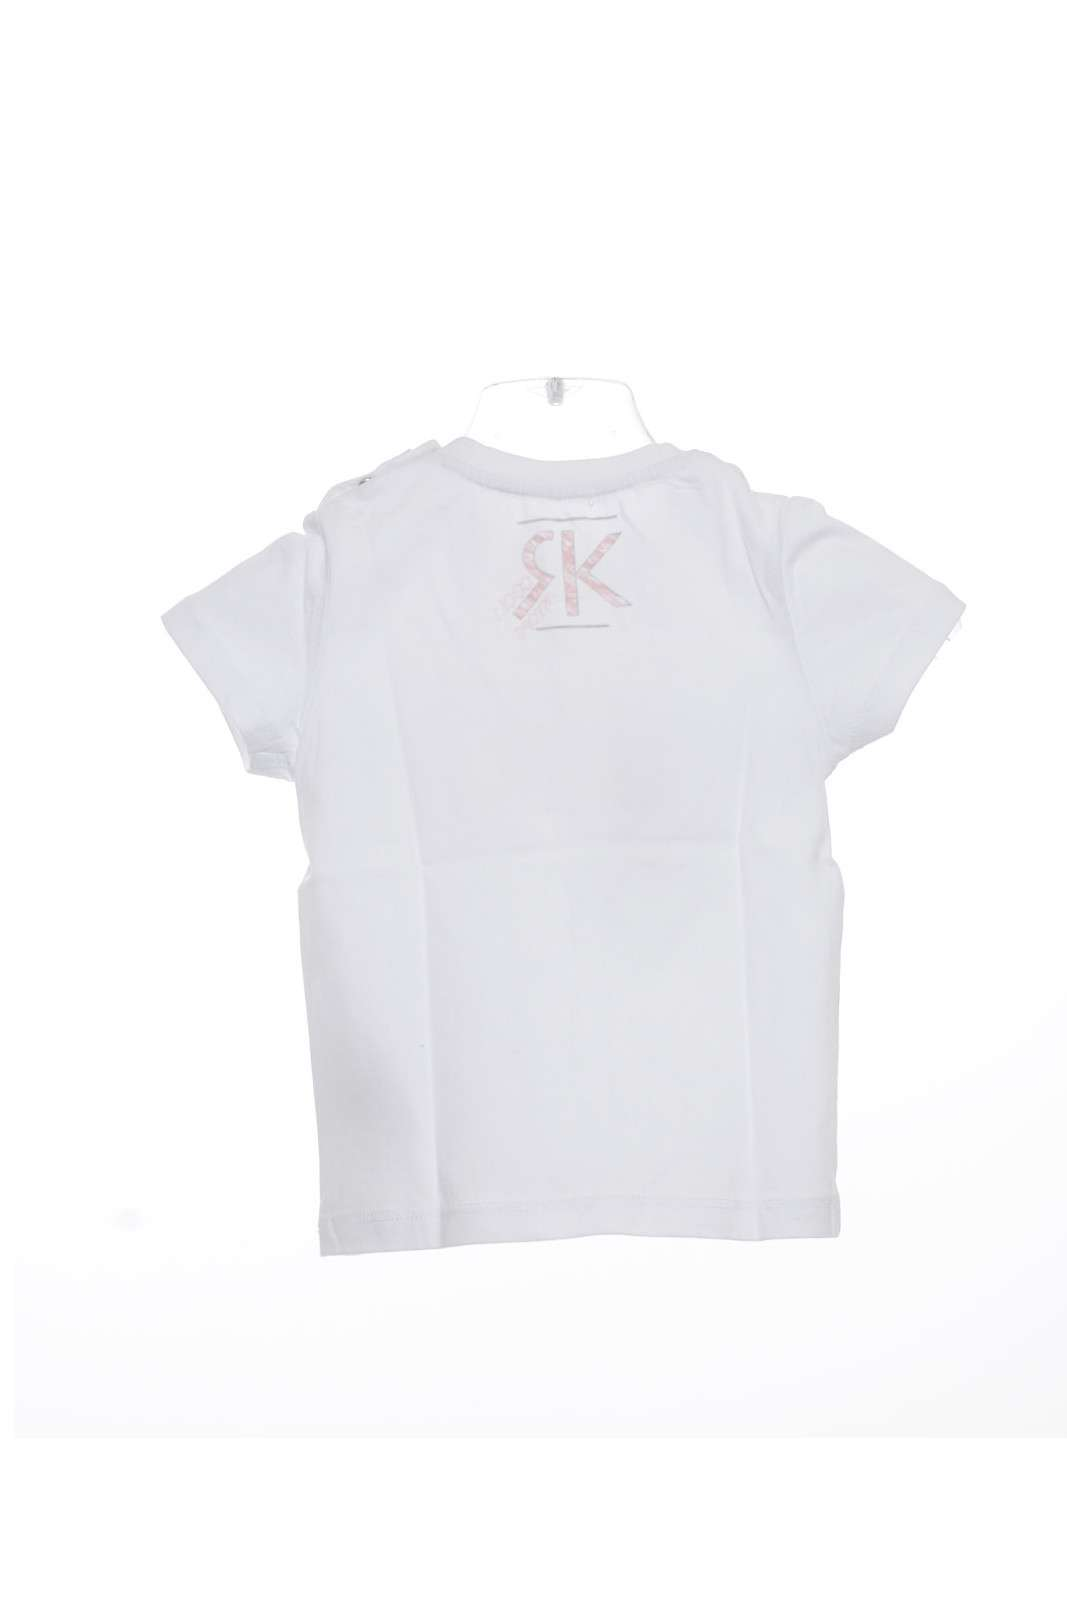 https://www.parmax.com/media/catalog/product/a/i/PE-outlet_parmax-t-shirt-bambino-Ronnie-Kay-RK1647-B.jpg